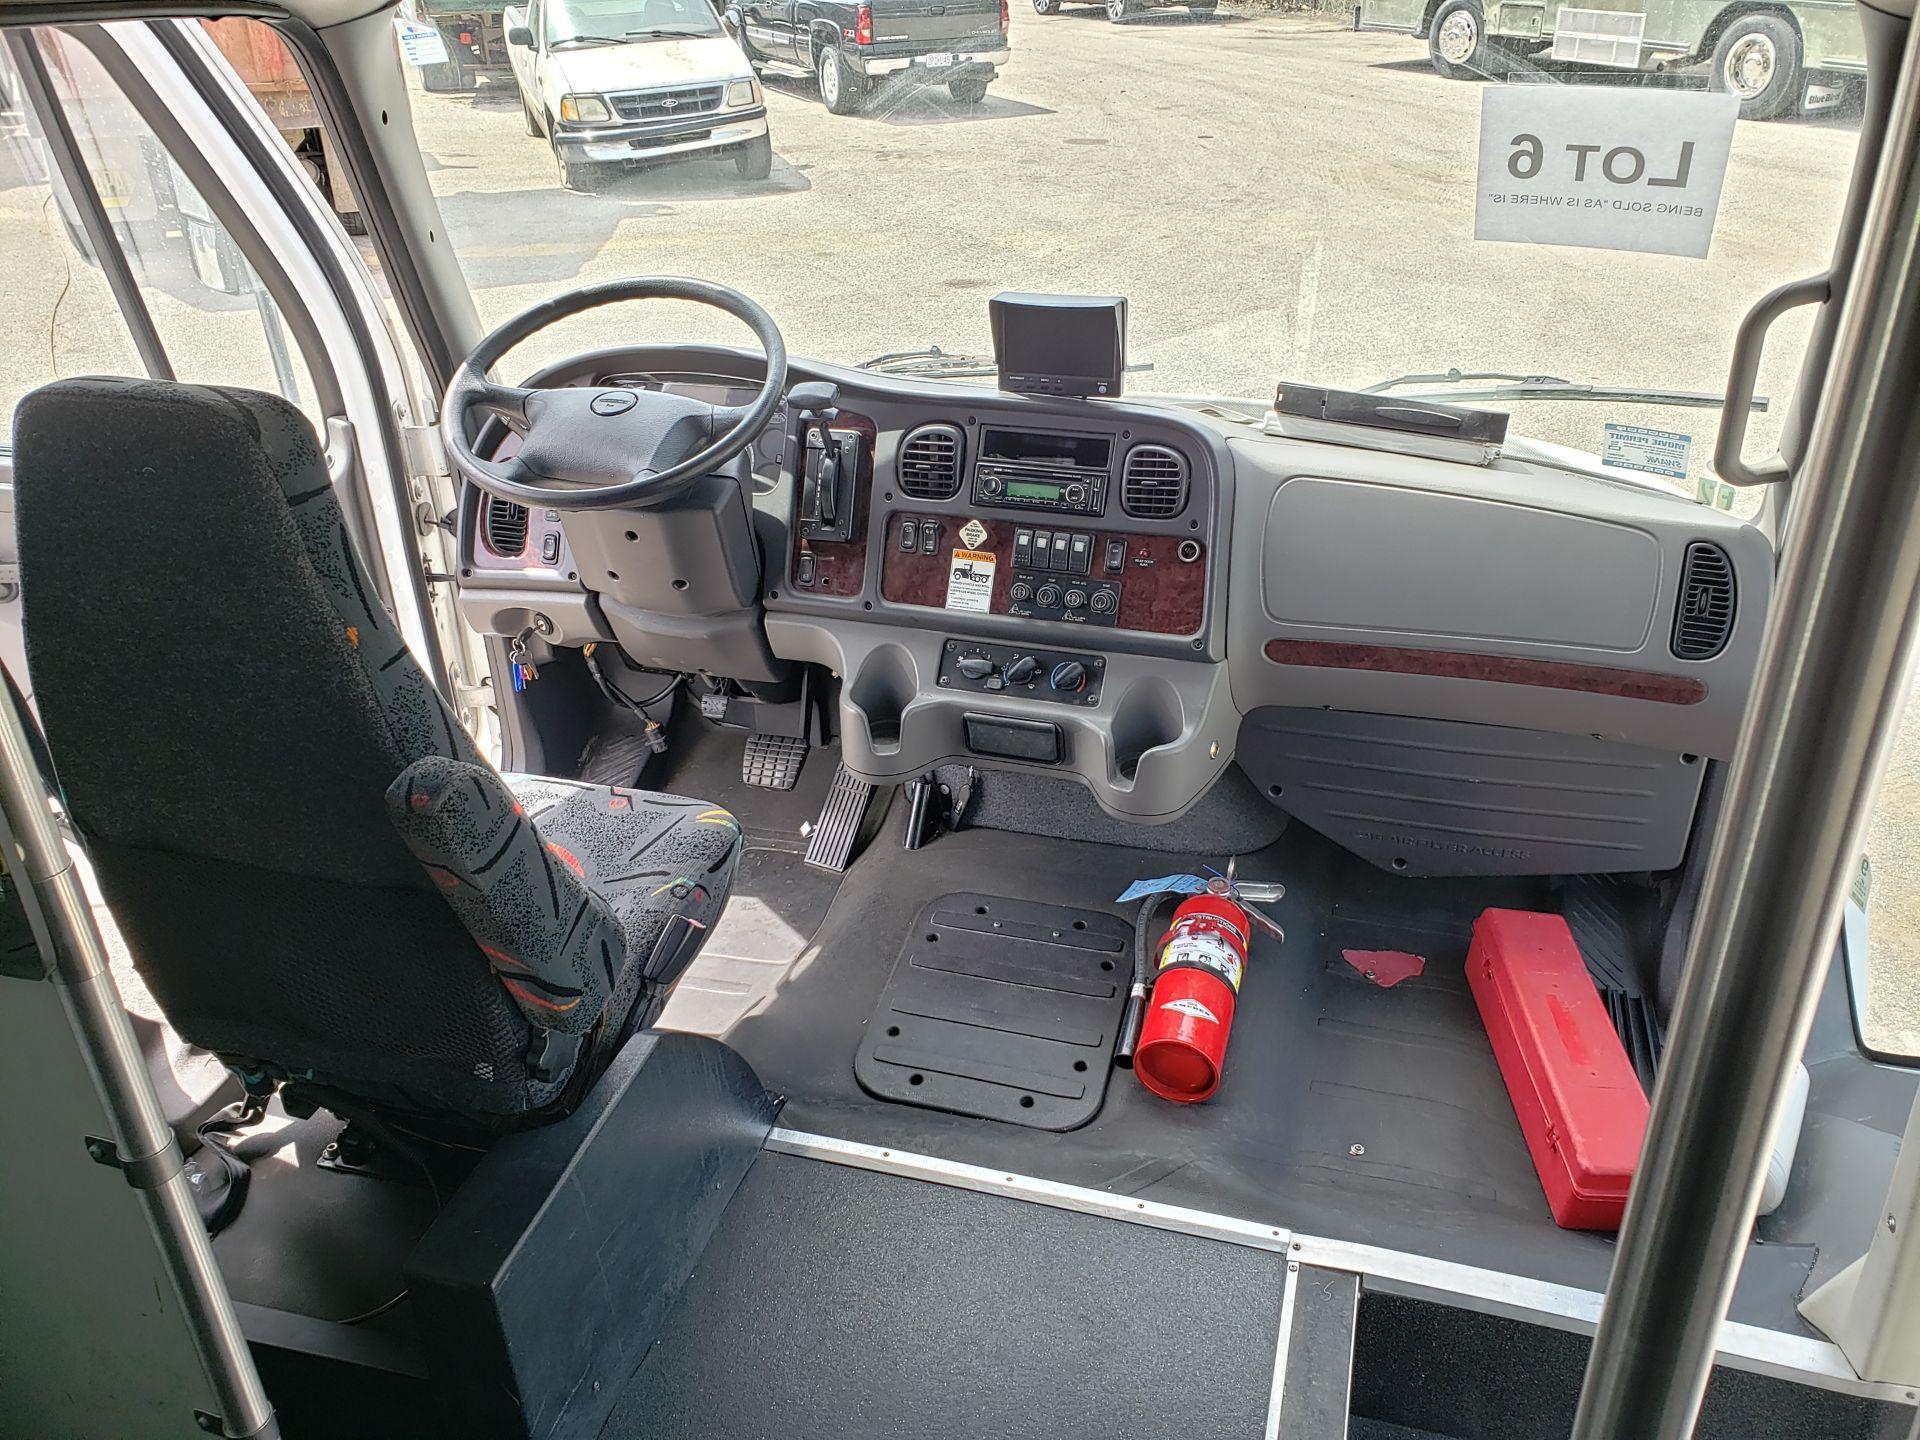 2013 Freightliner M2 106 33-Pass Champion Defender Shuttle Bus - Image 13 of 17